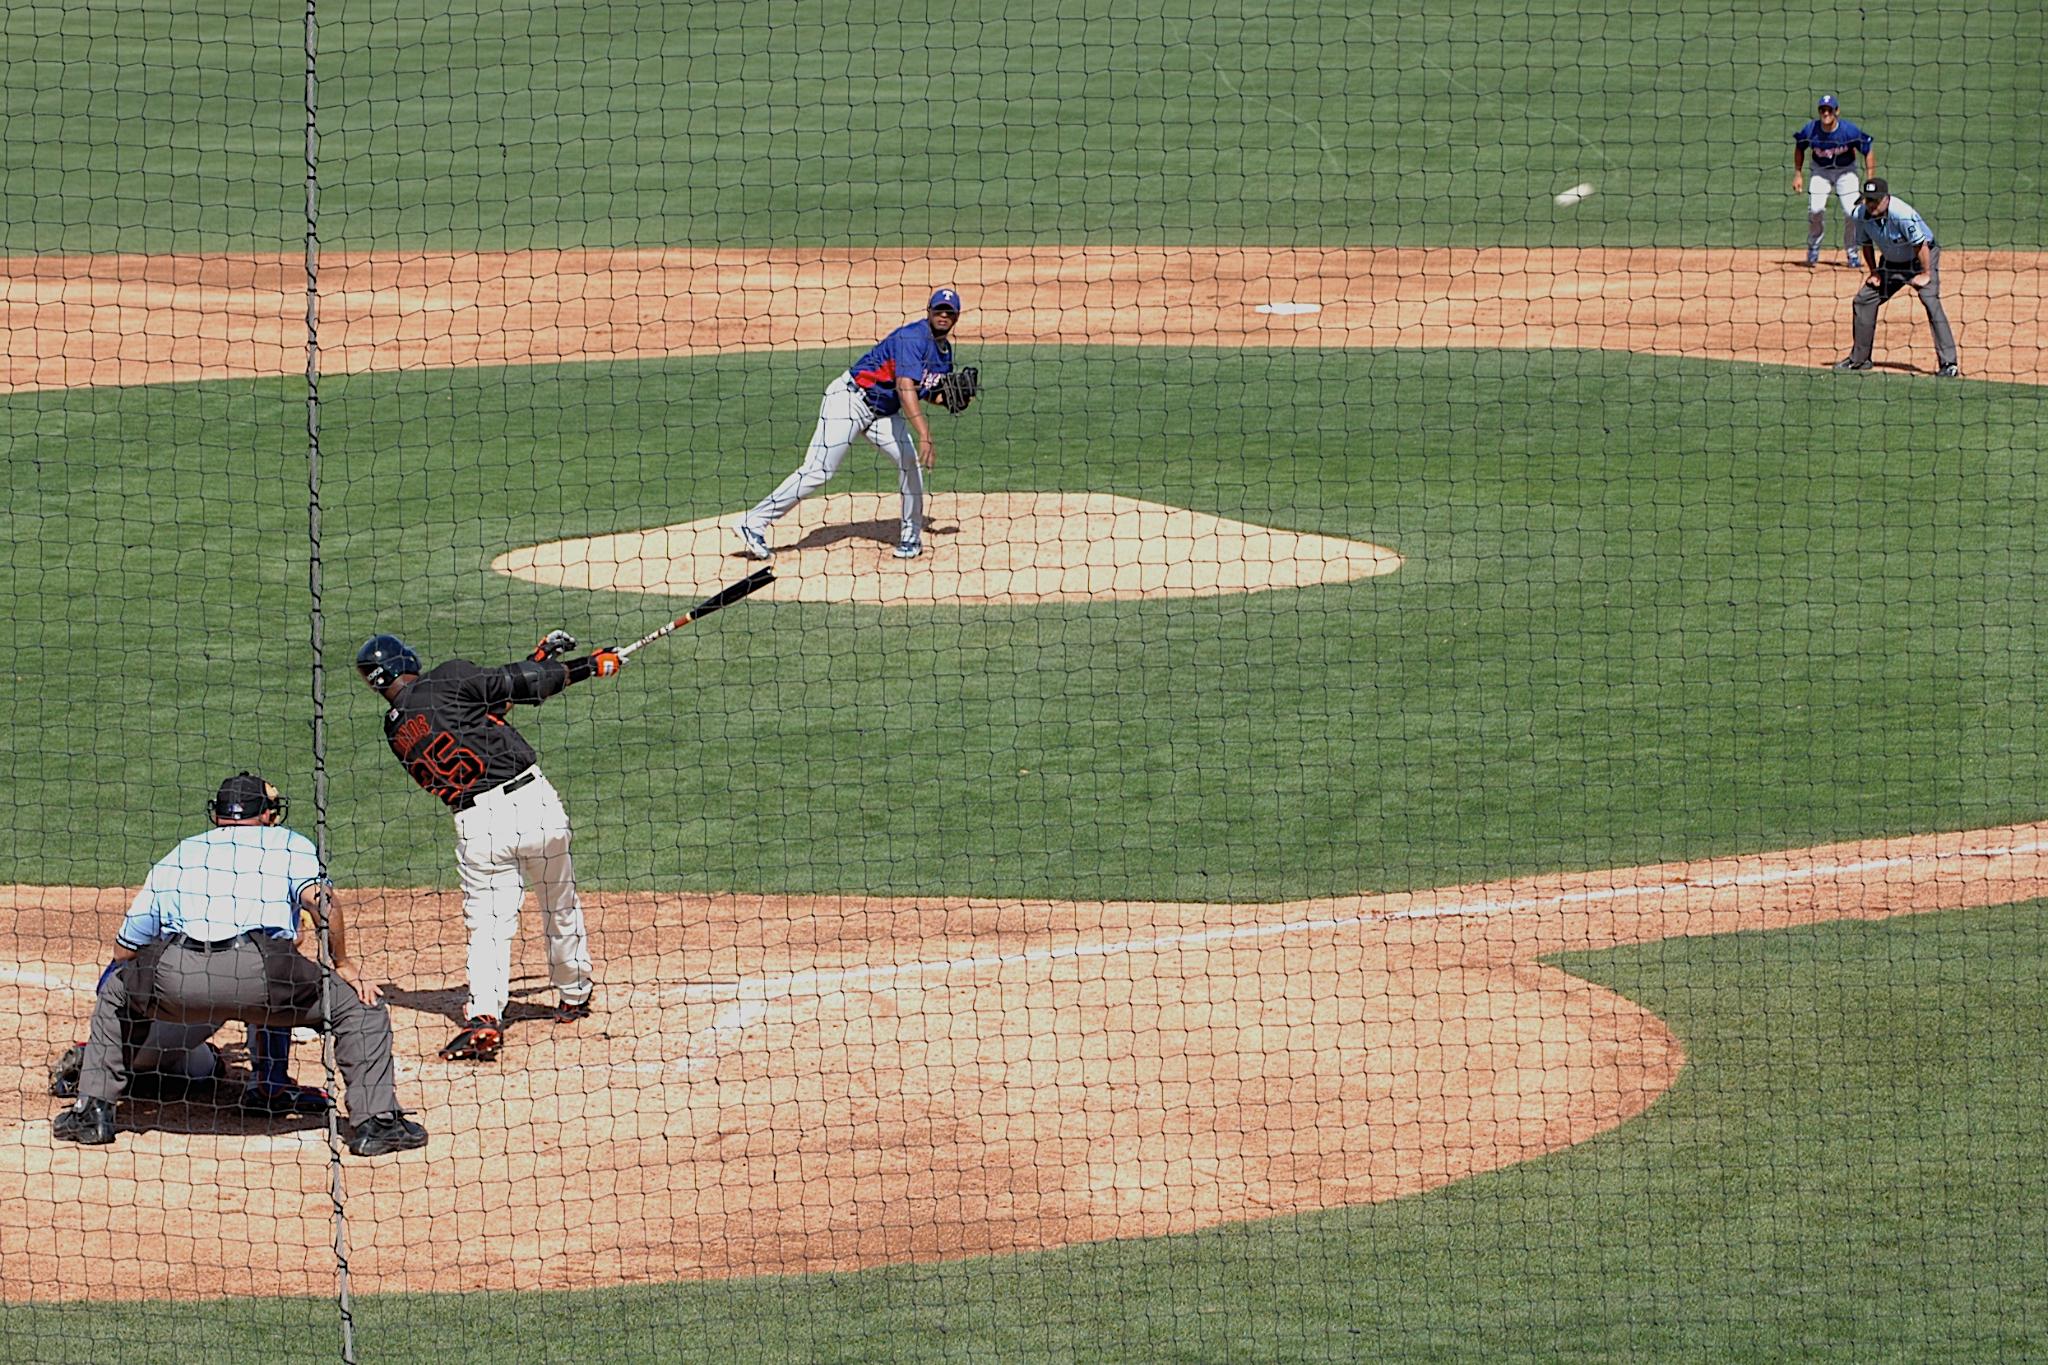 Barry Bonds Home Run, Spring Training,Scottsdale, AZ 2006